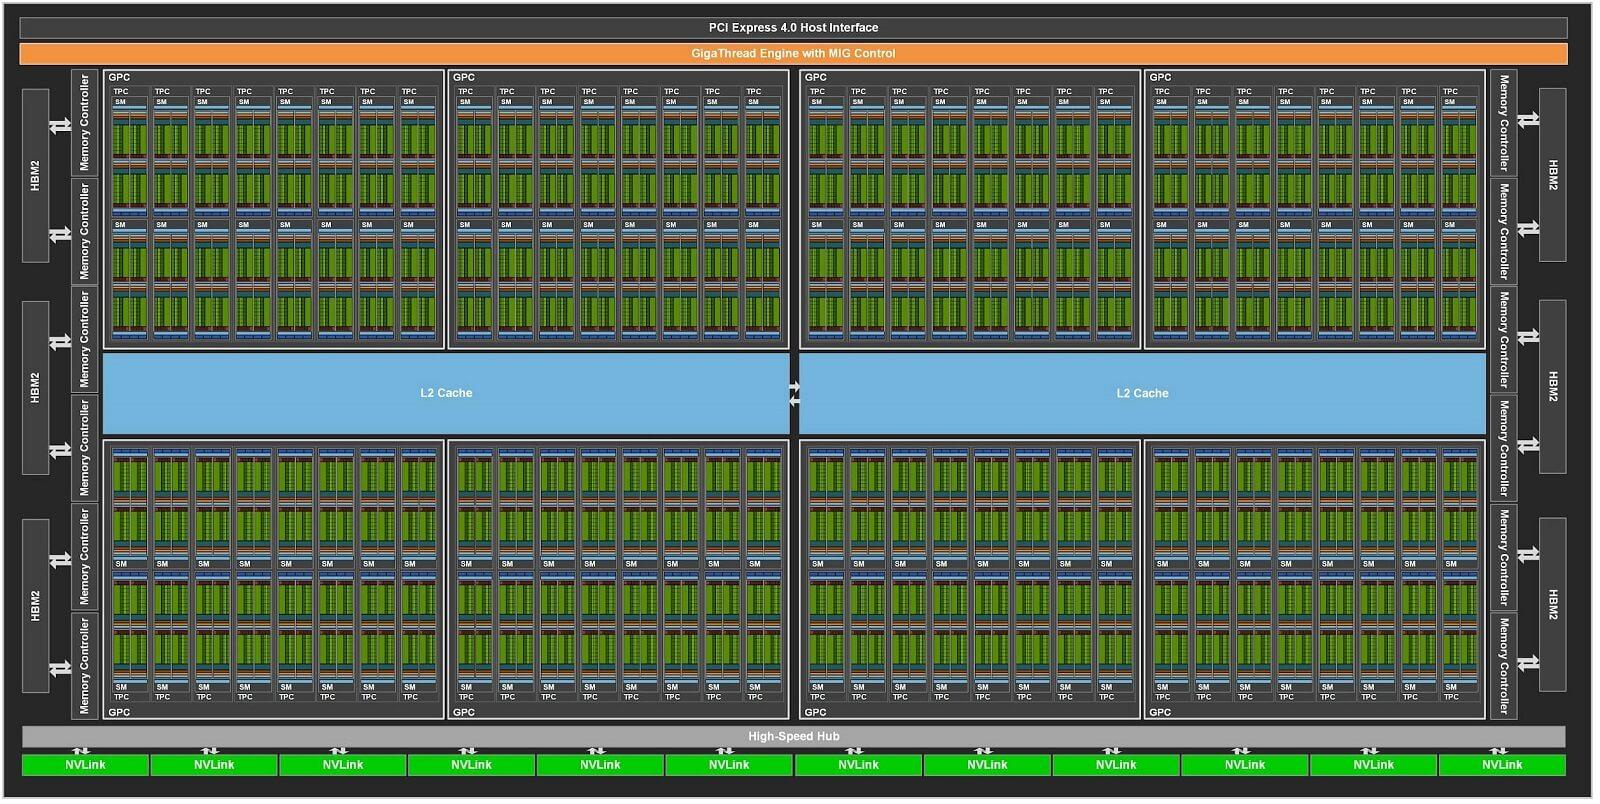 Nvidia Ampere GA100 Block Diagram